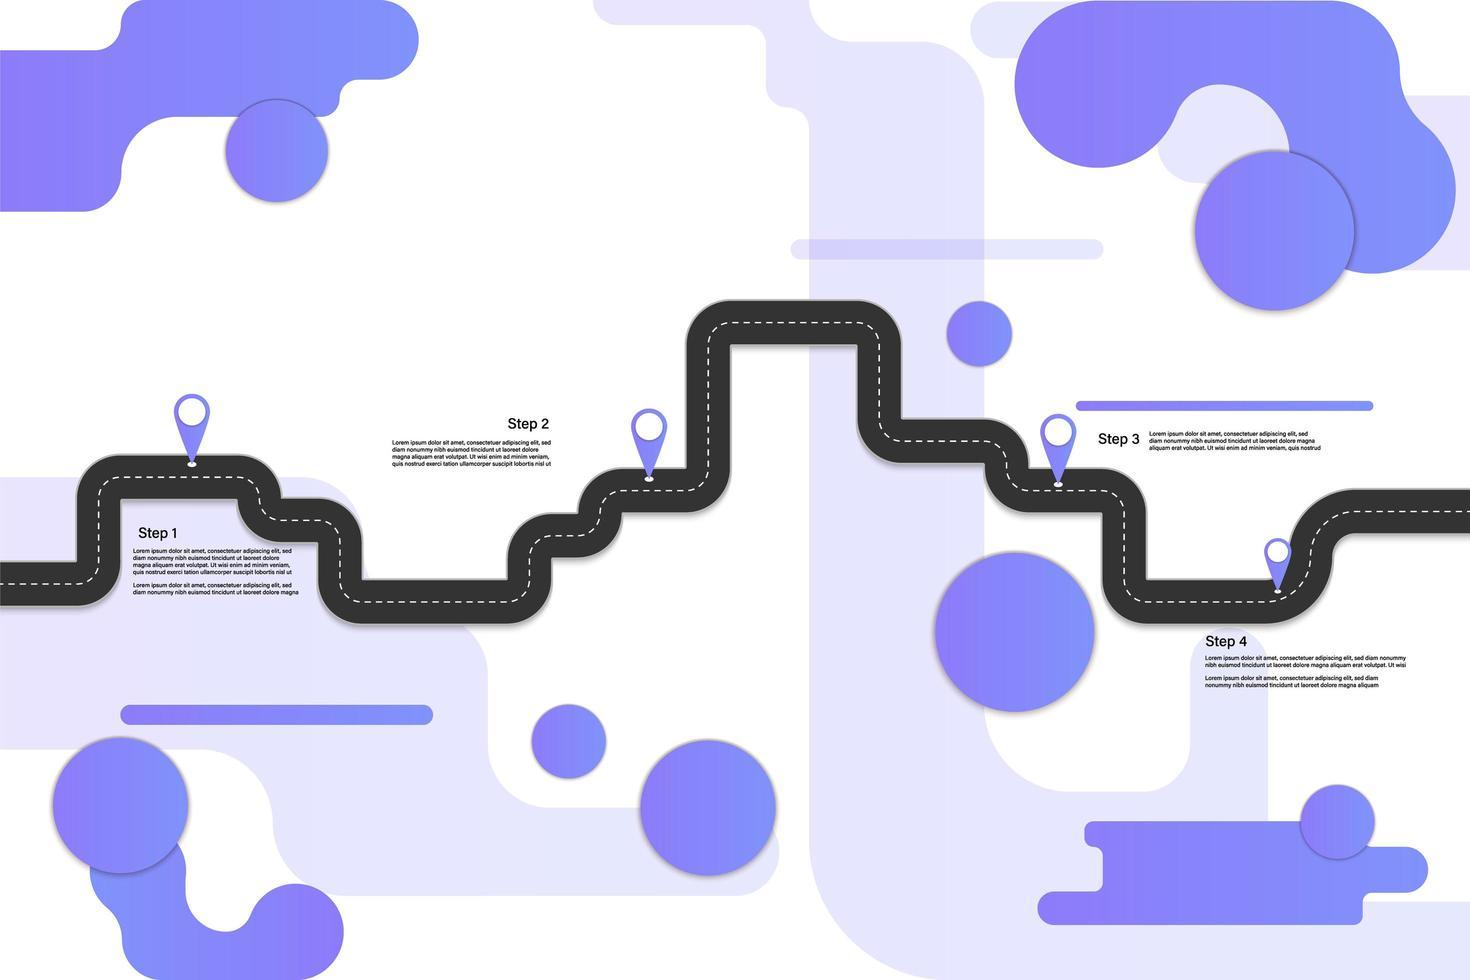 moderne stijl geometrische reis infographic vector